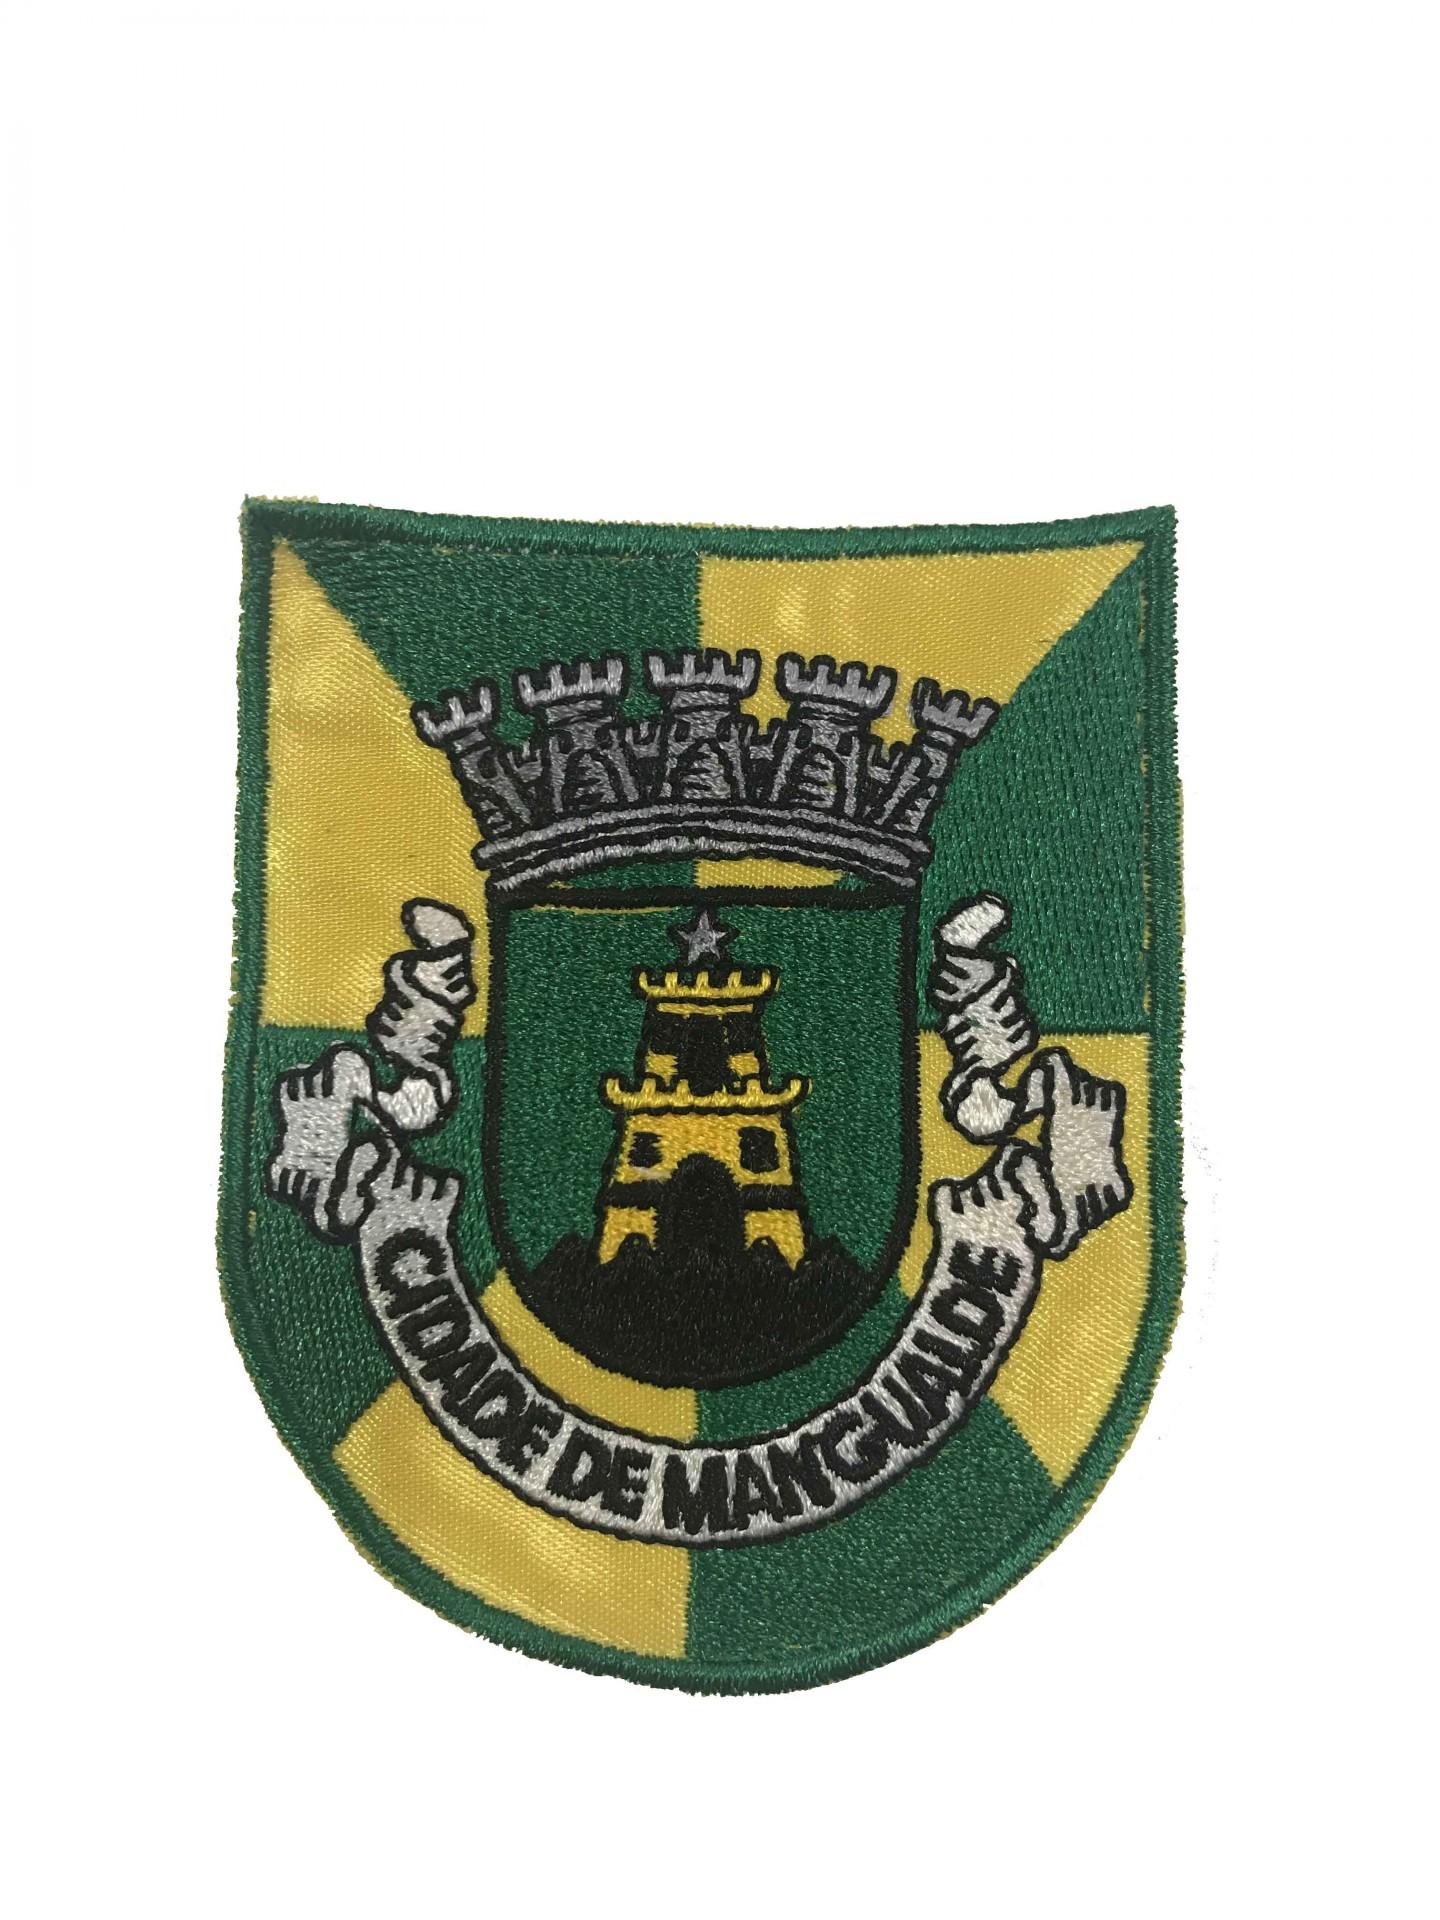 Emblema Mangualde